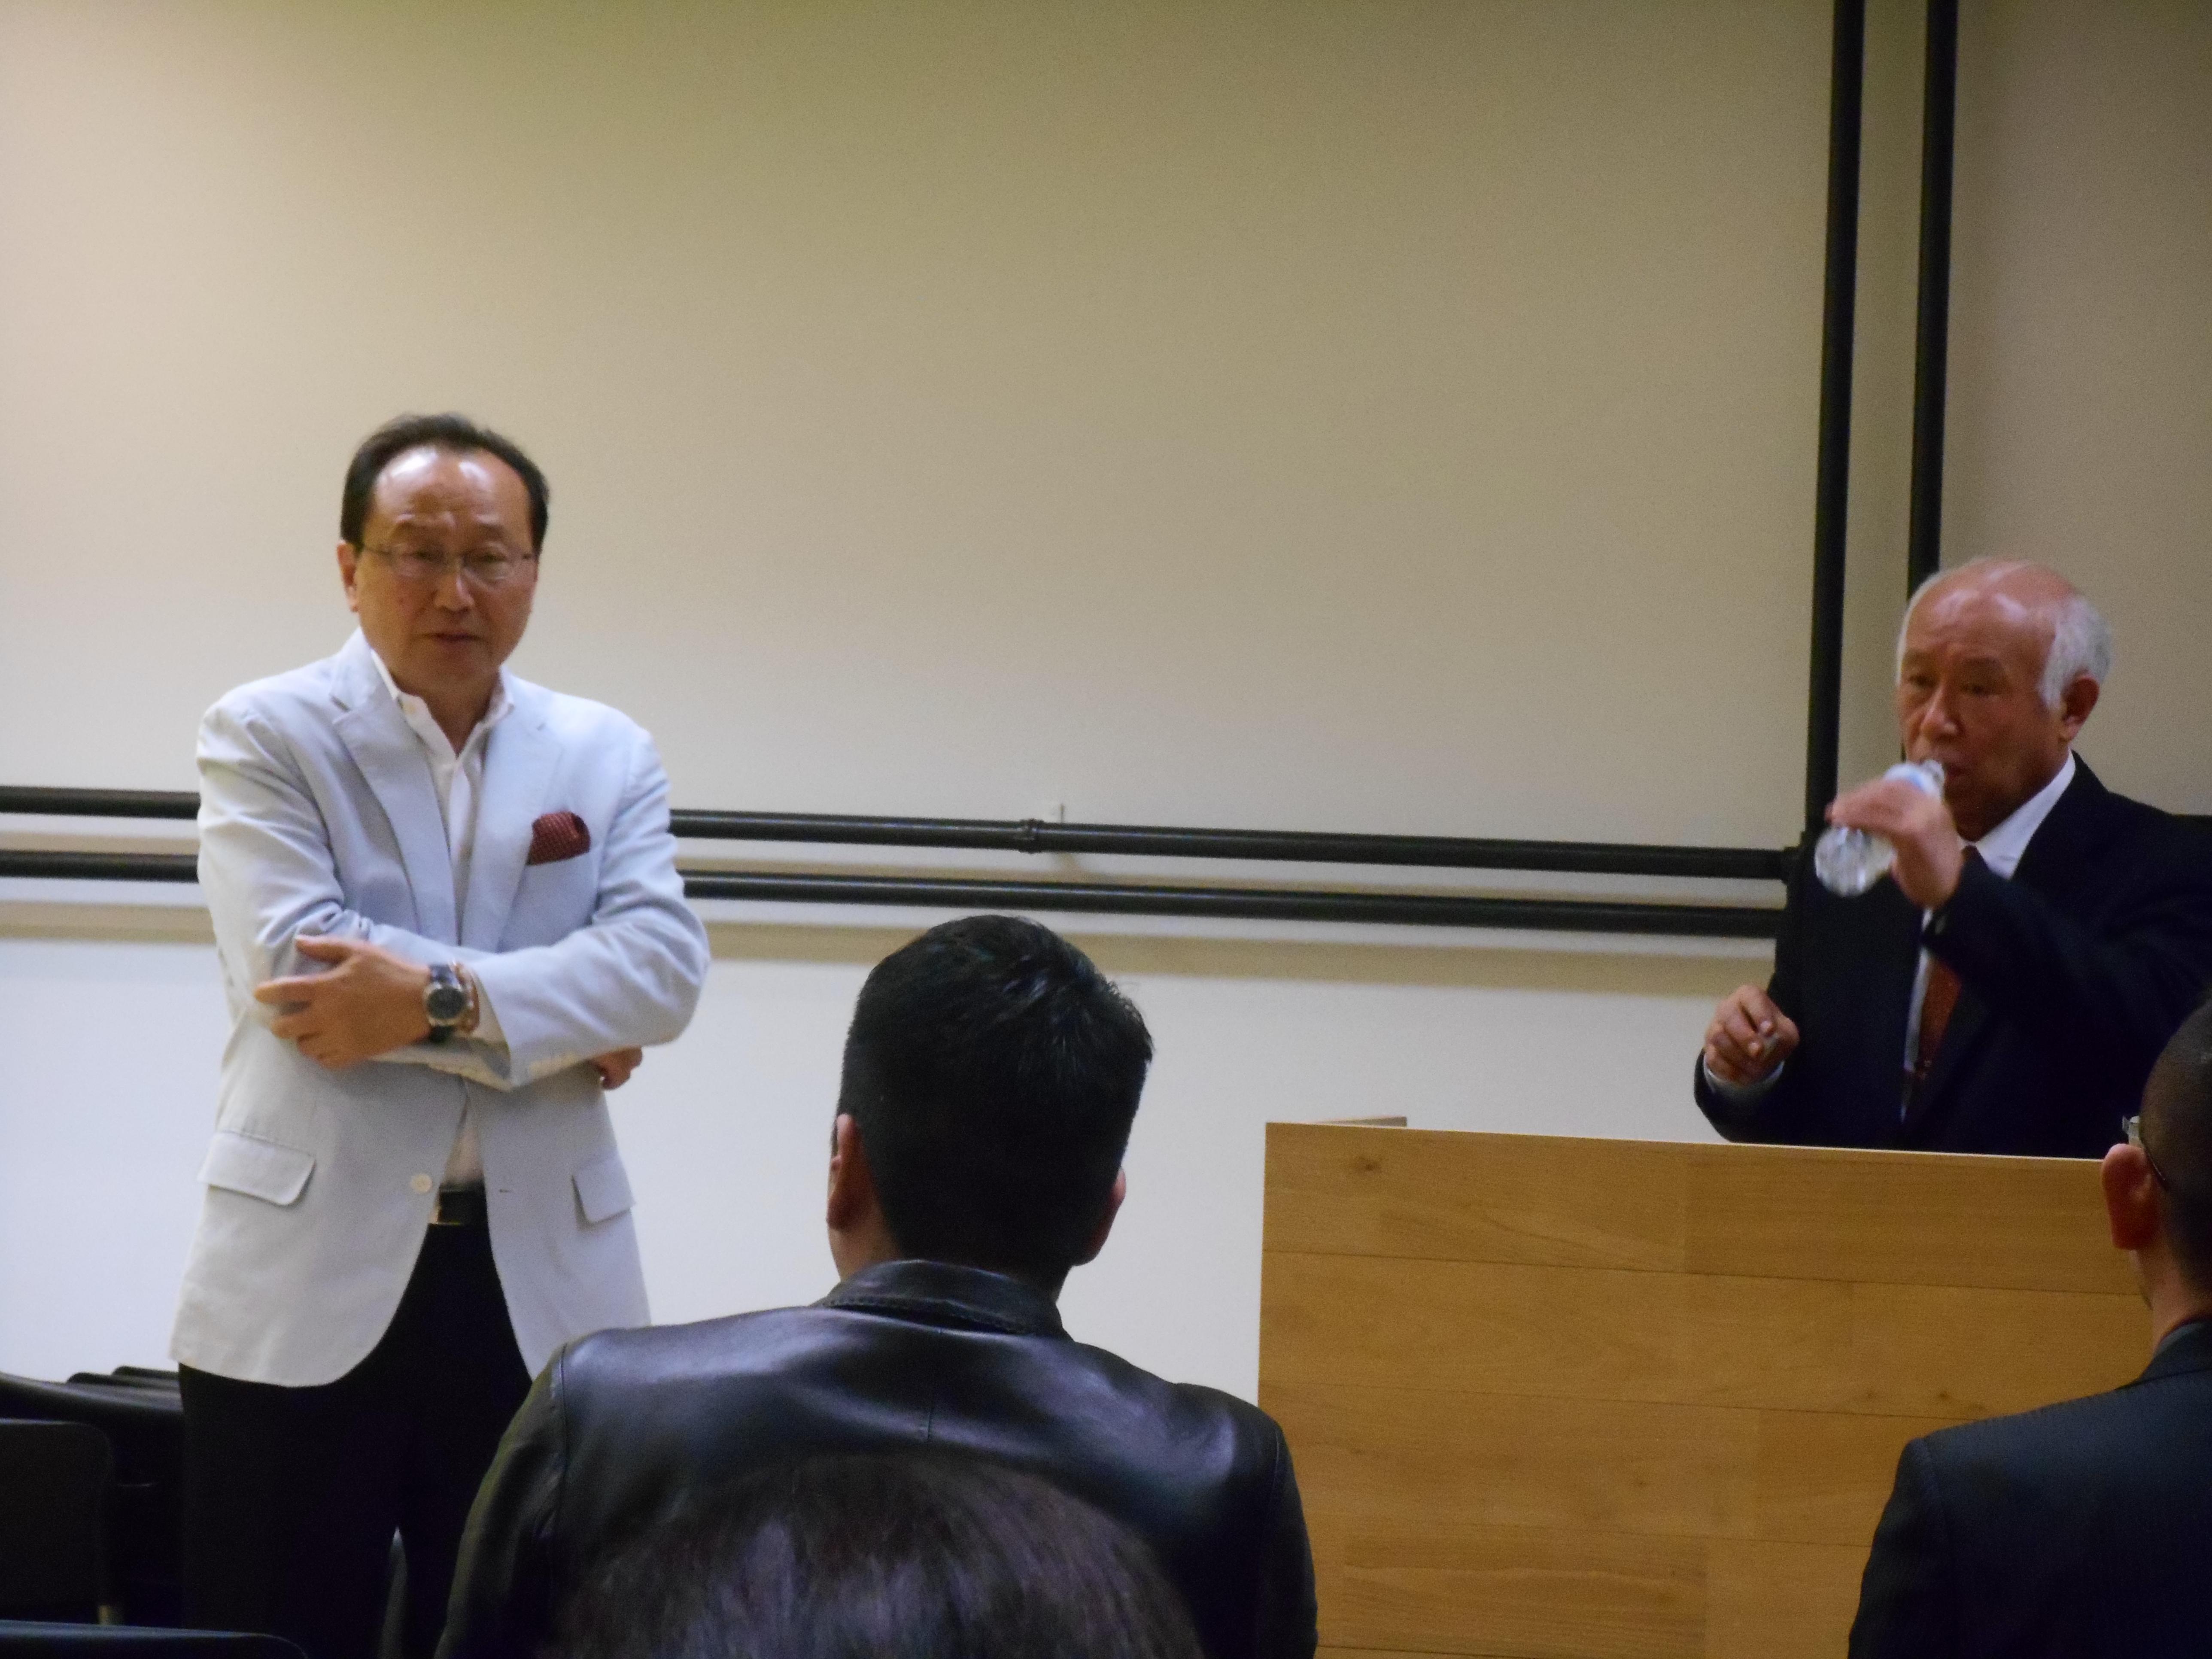 DSCN3735 - 2017年2月4日東京思風塾開催